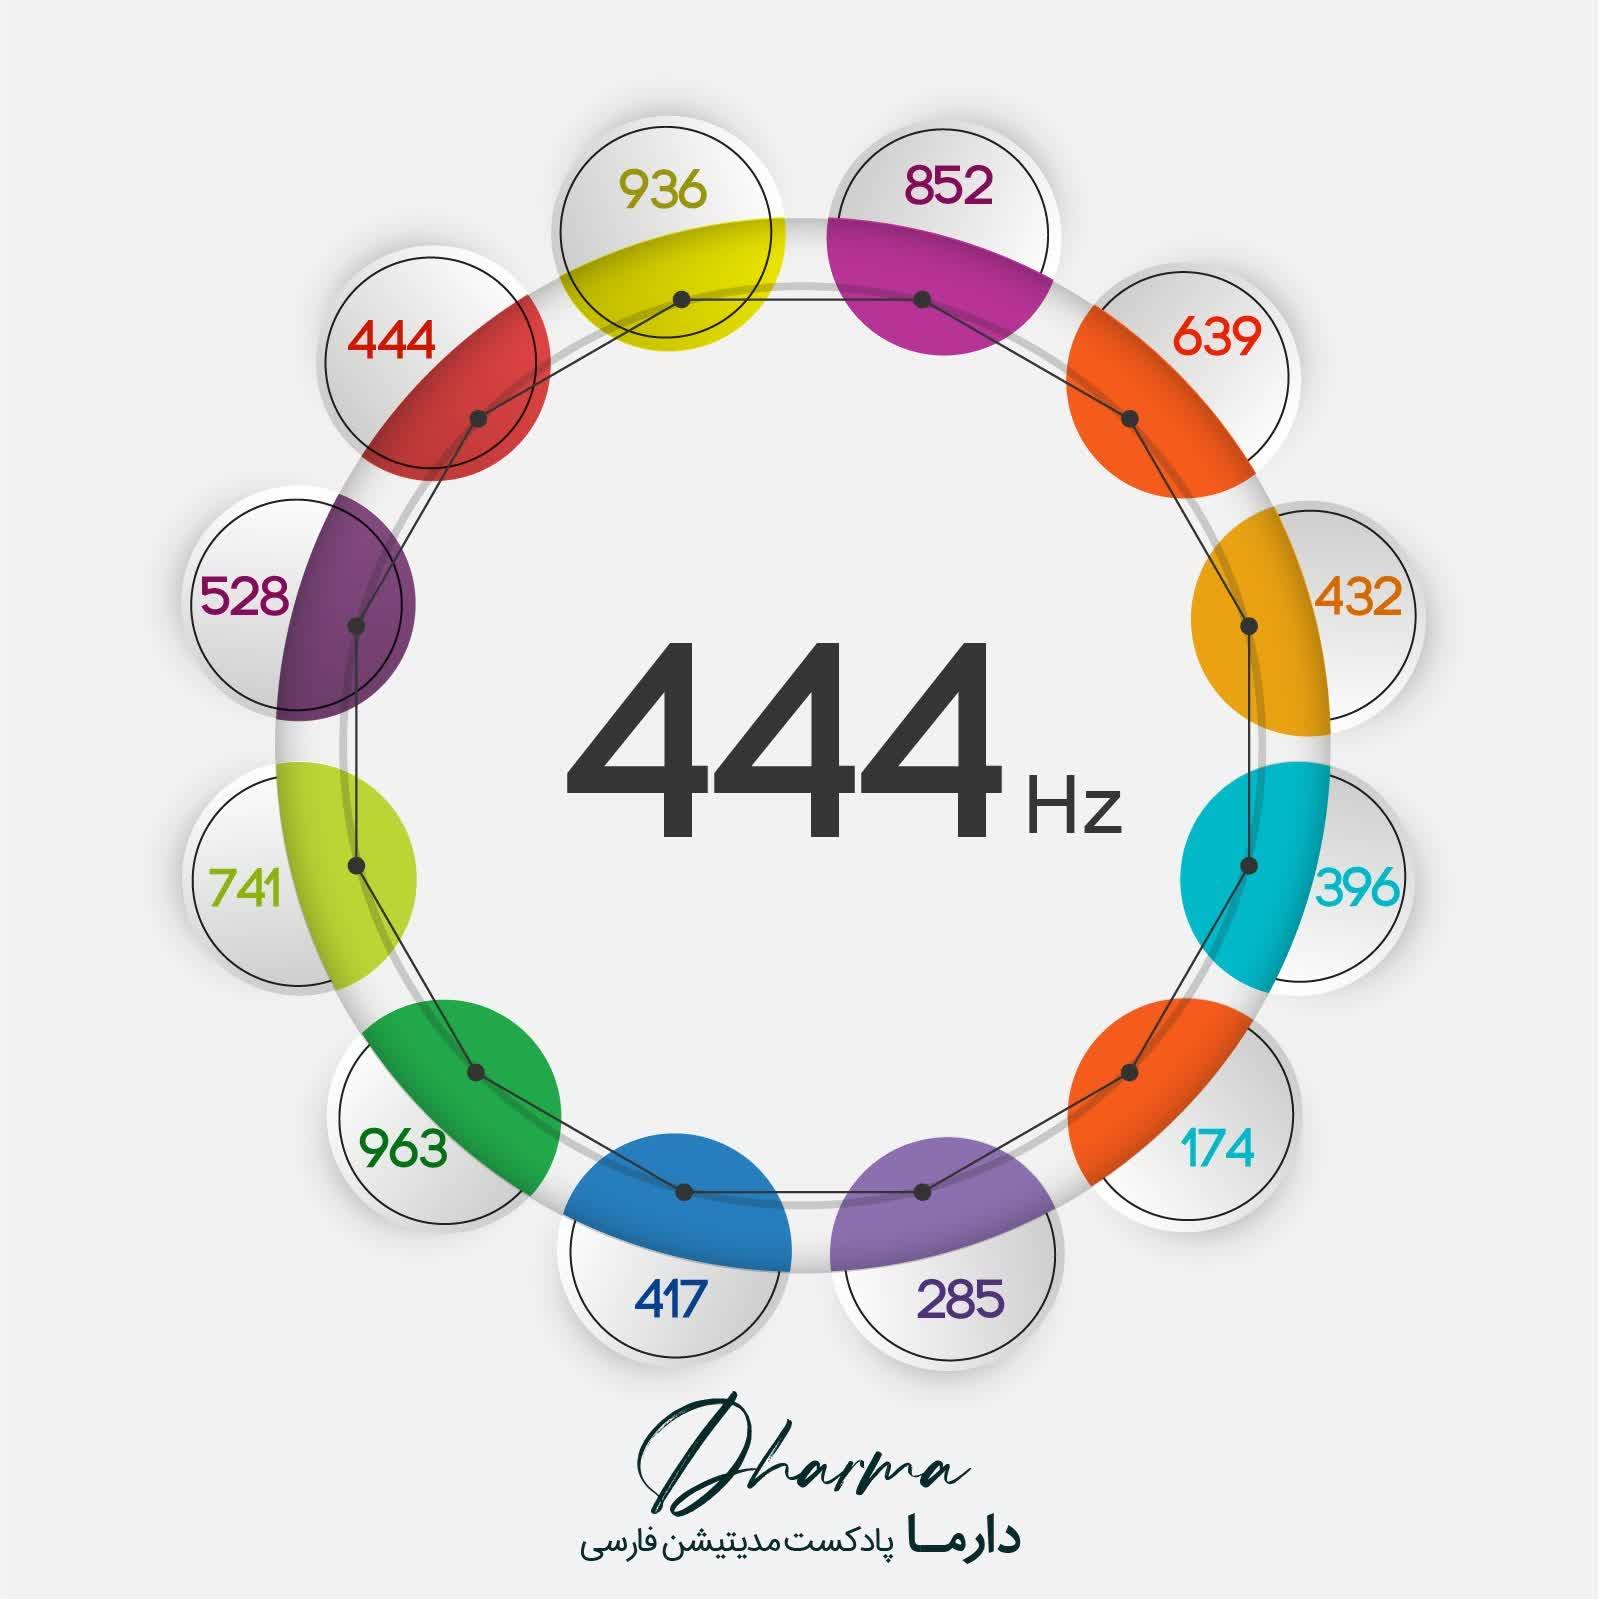 444Hz - فرکانس 444 هرتز